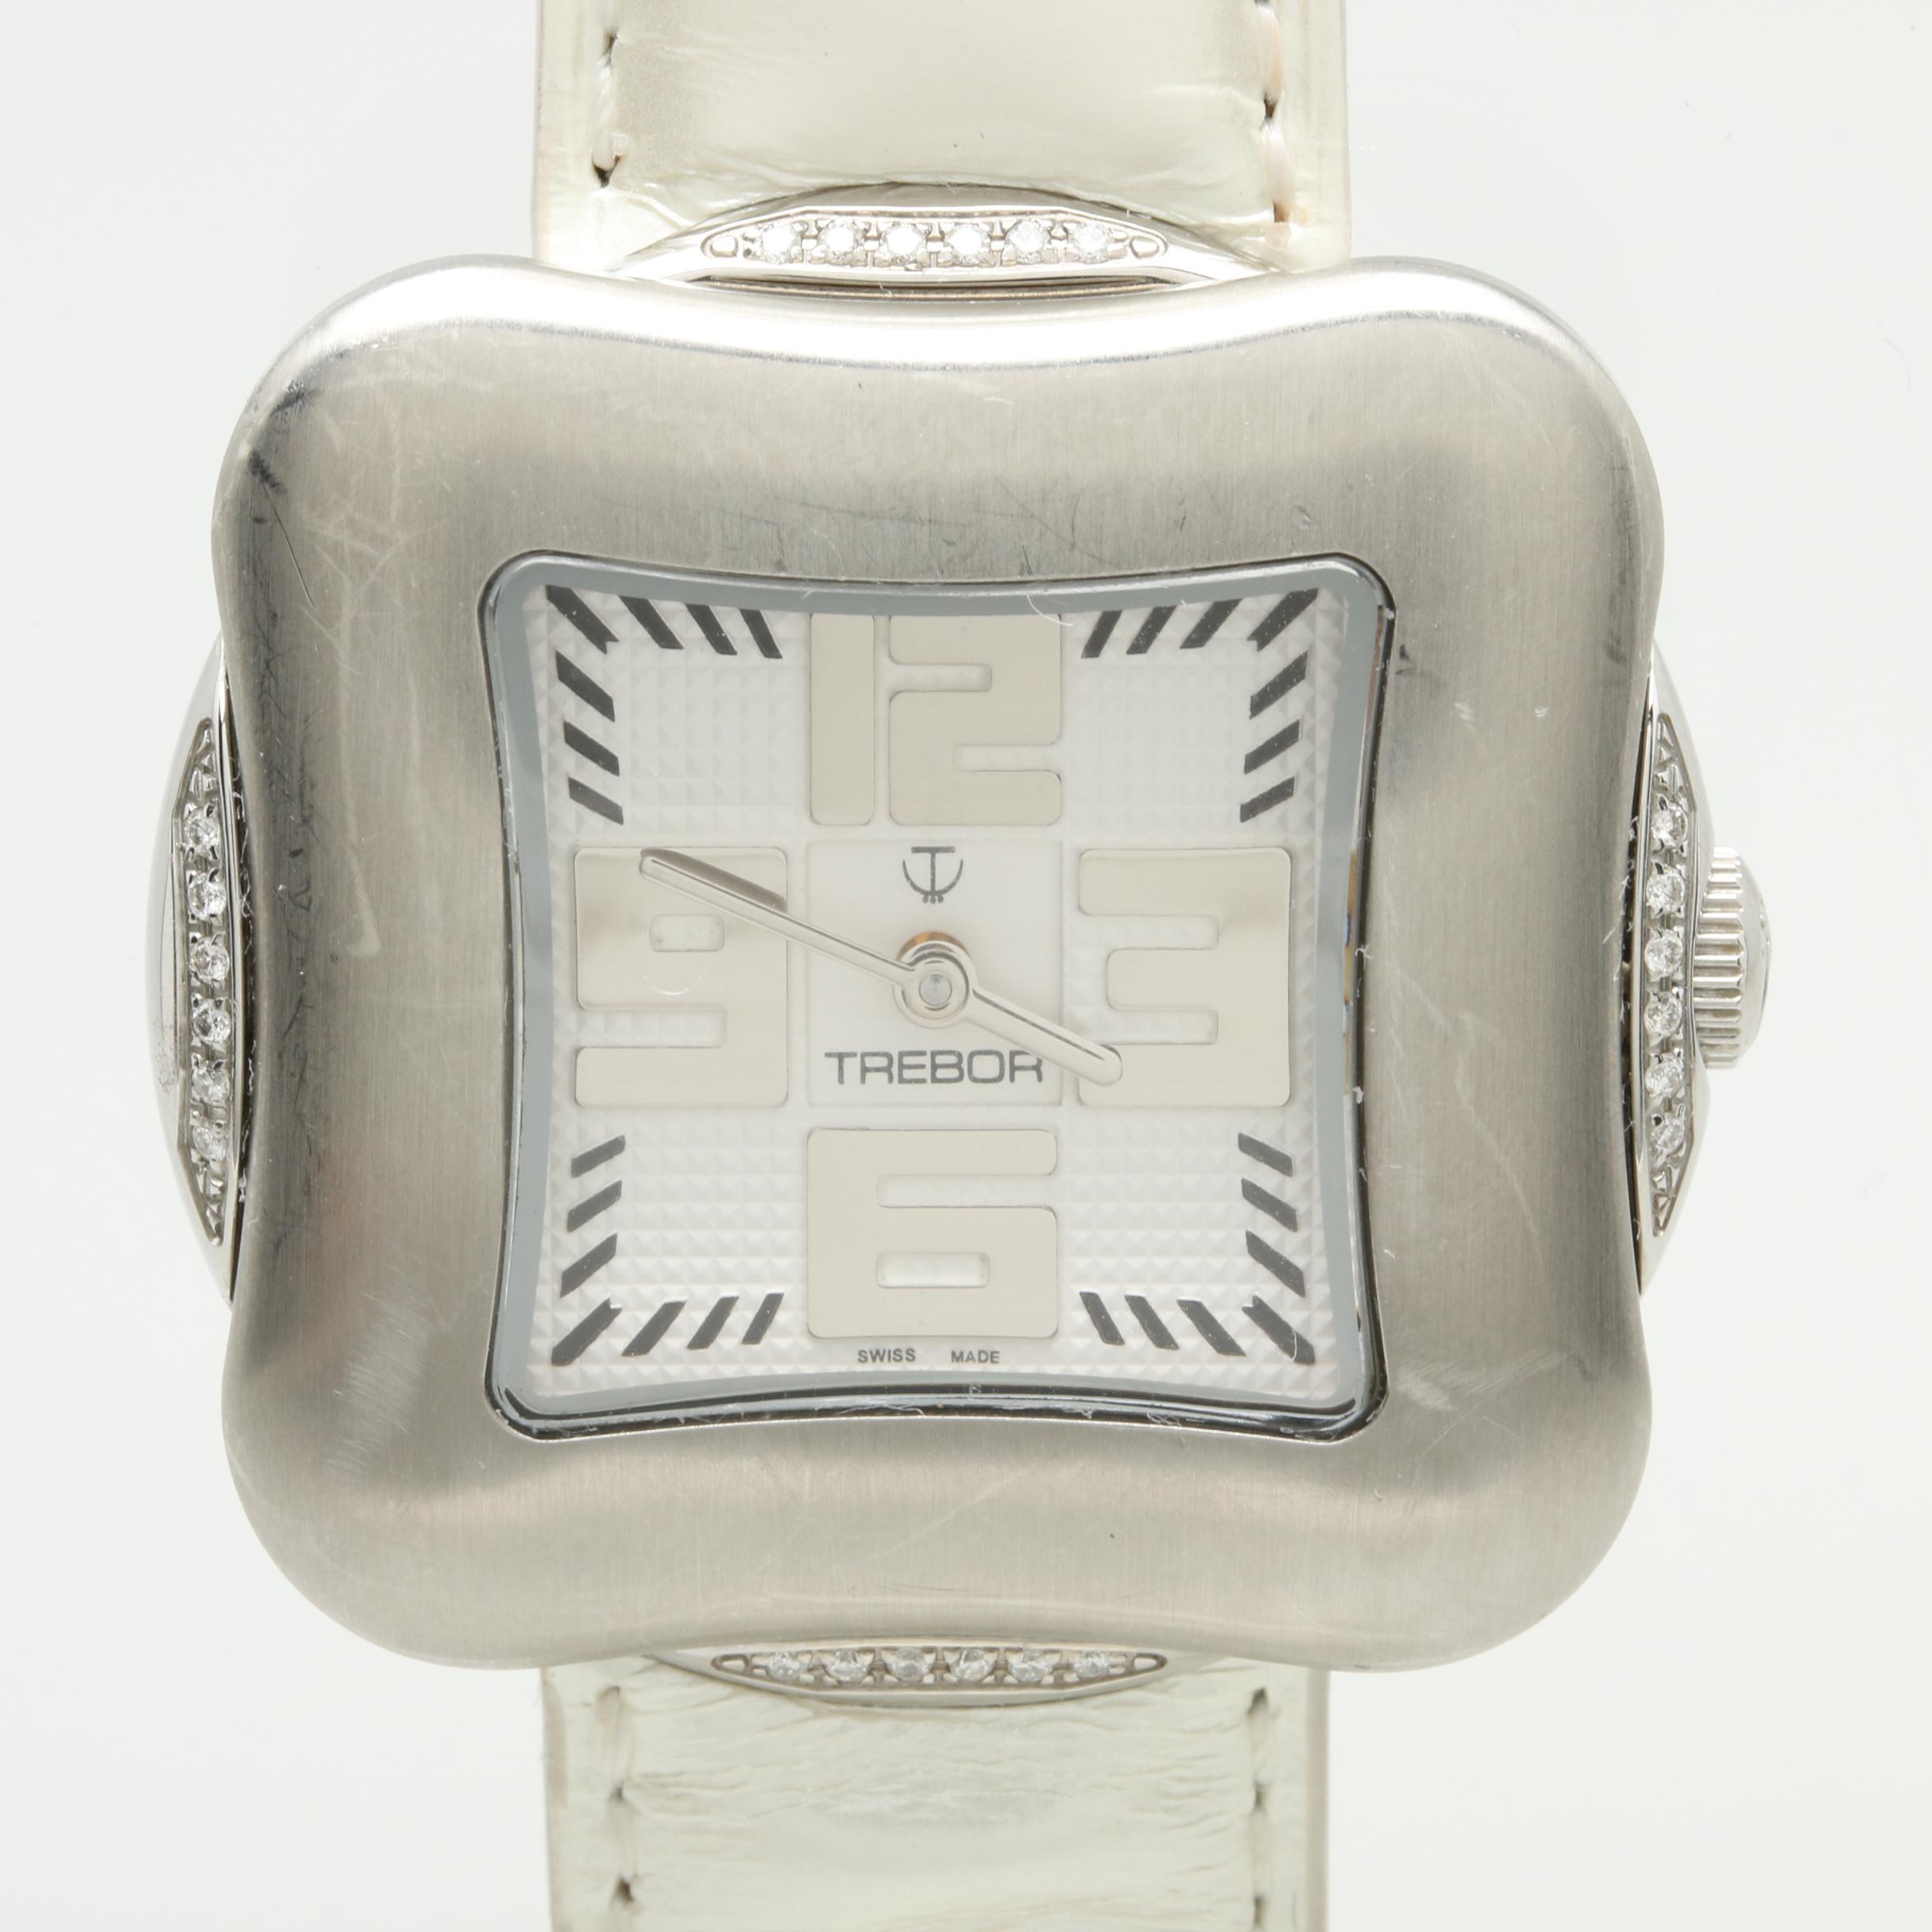 Trebor Stainless Steel Diamond Wristwatch